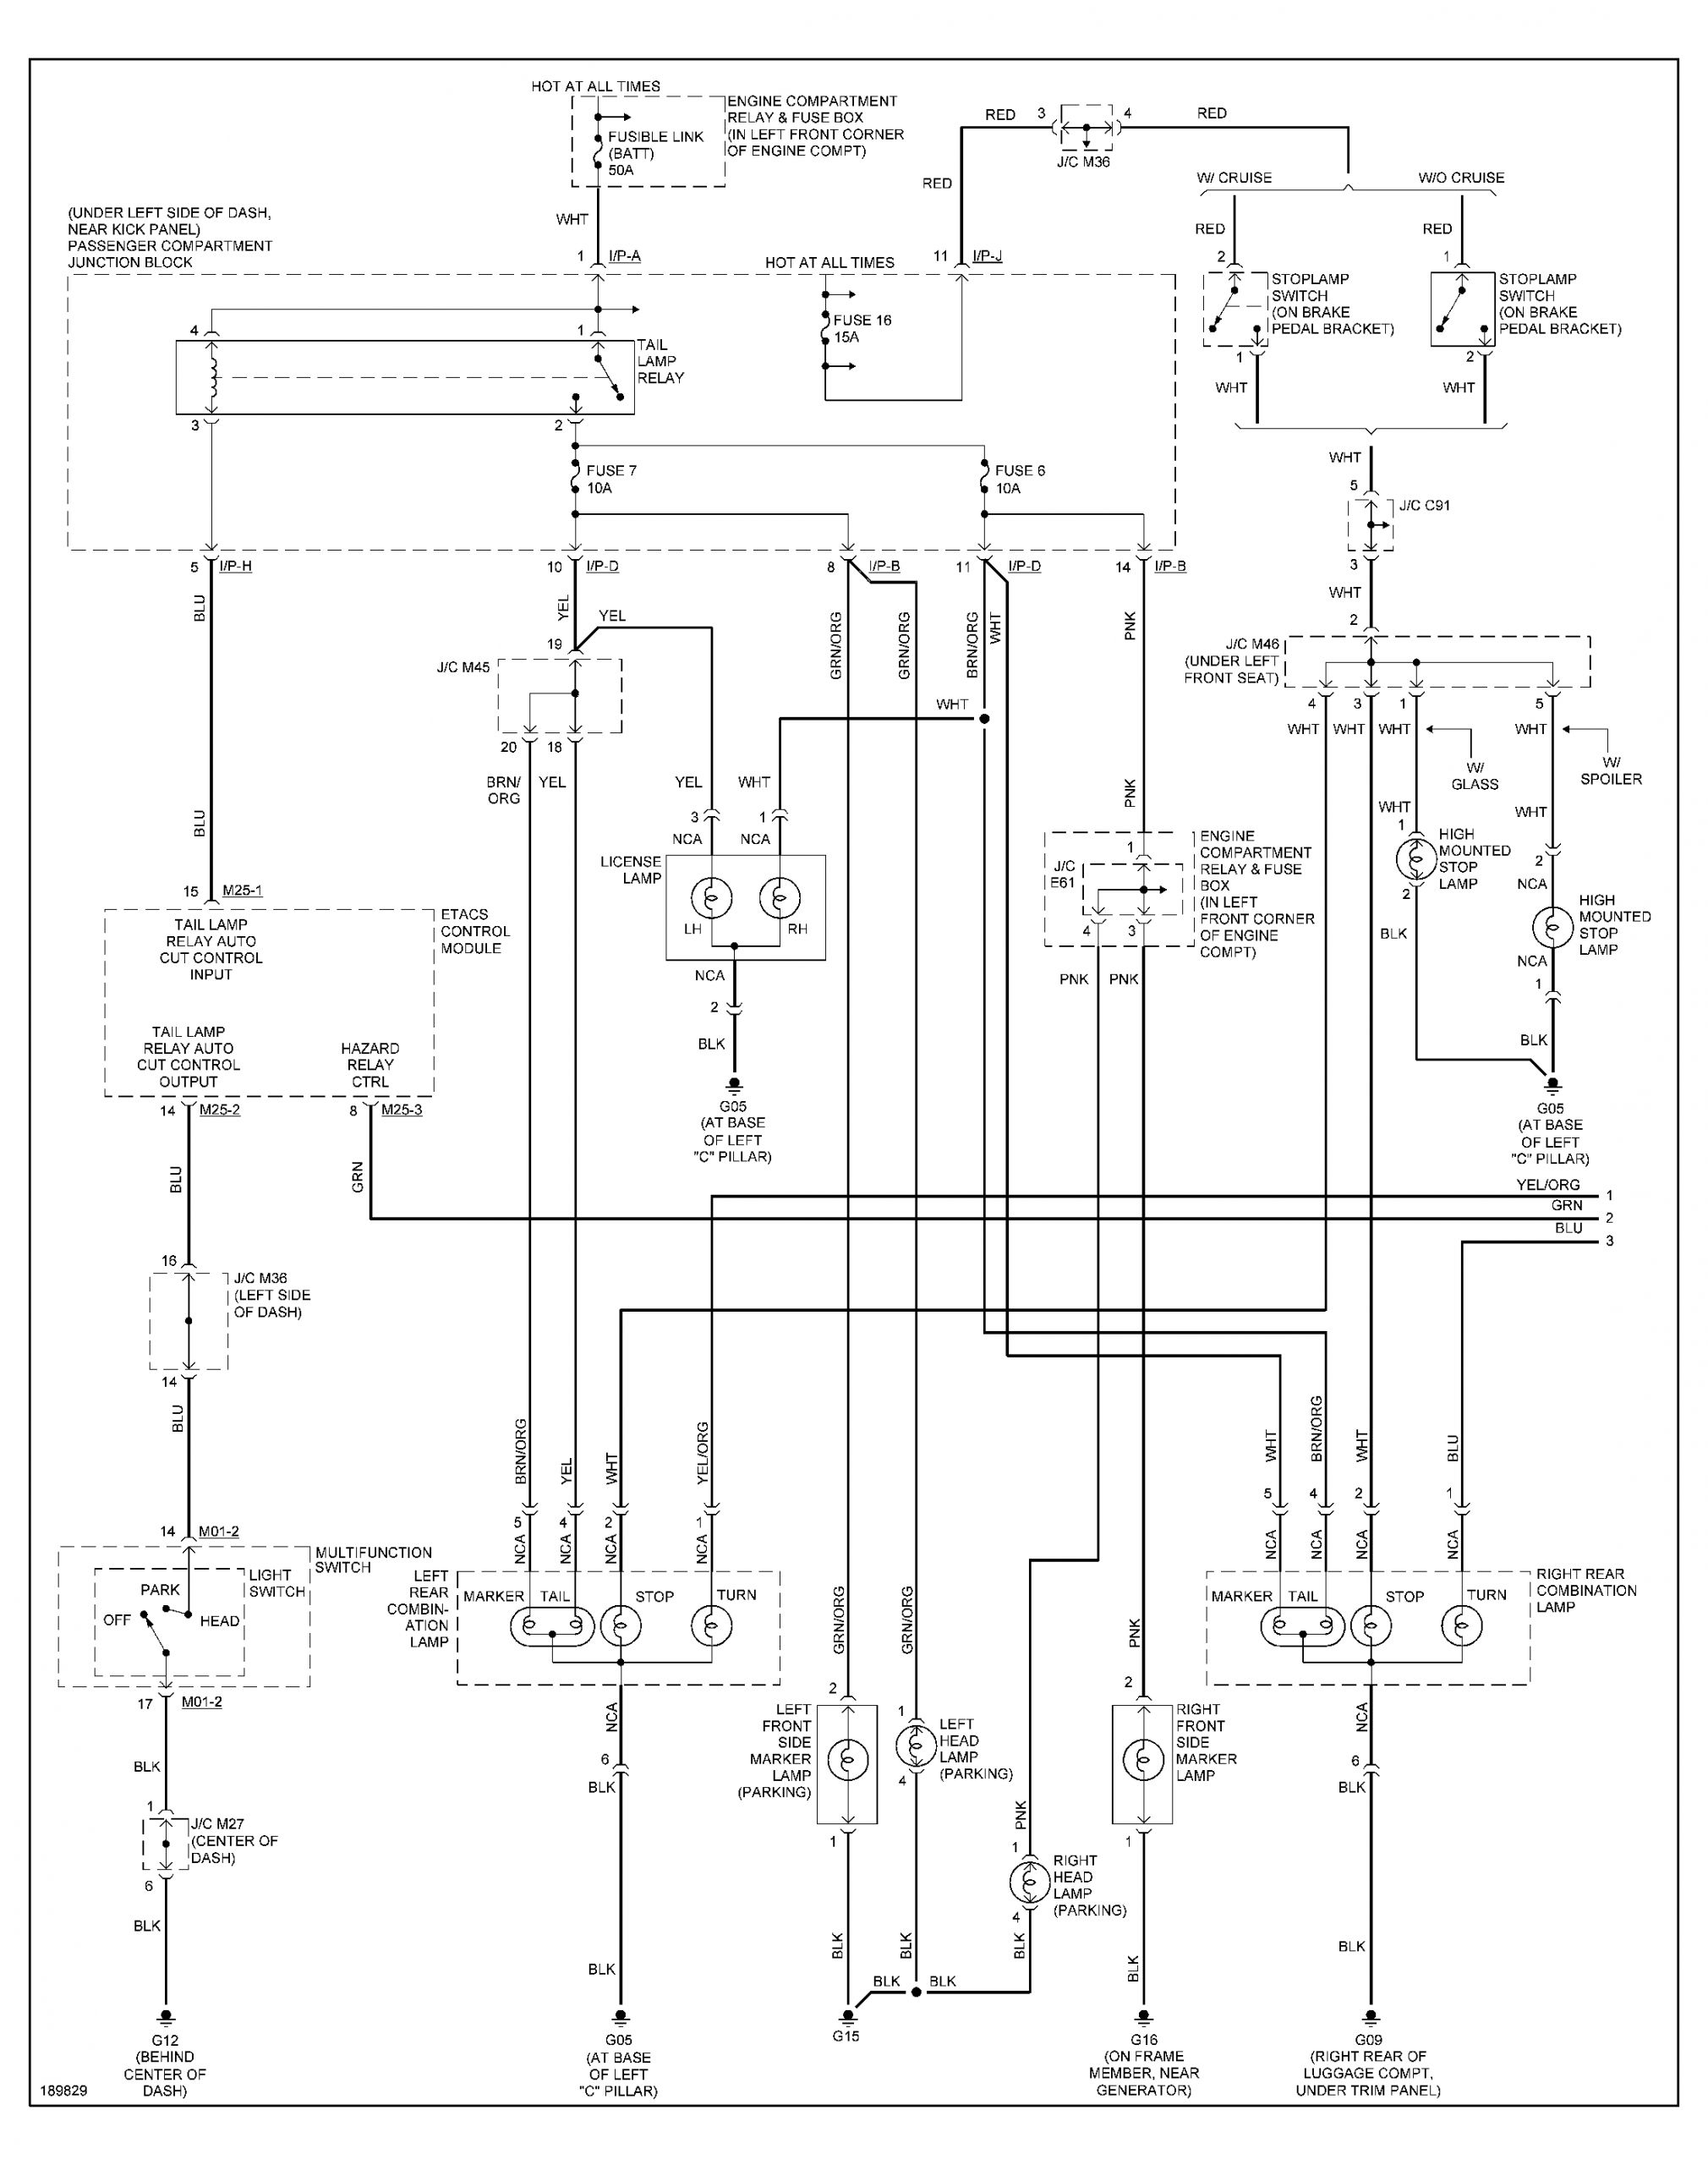 Hyundai Accent Headlight Wiring Diagram Ffd 08 Hyundai Accent Wiring Diagram Auto Zone Wiring